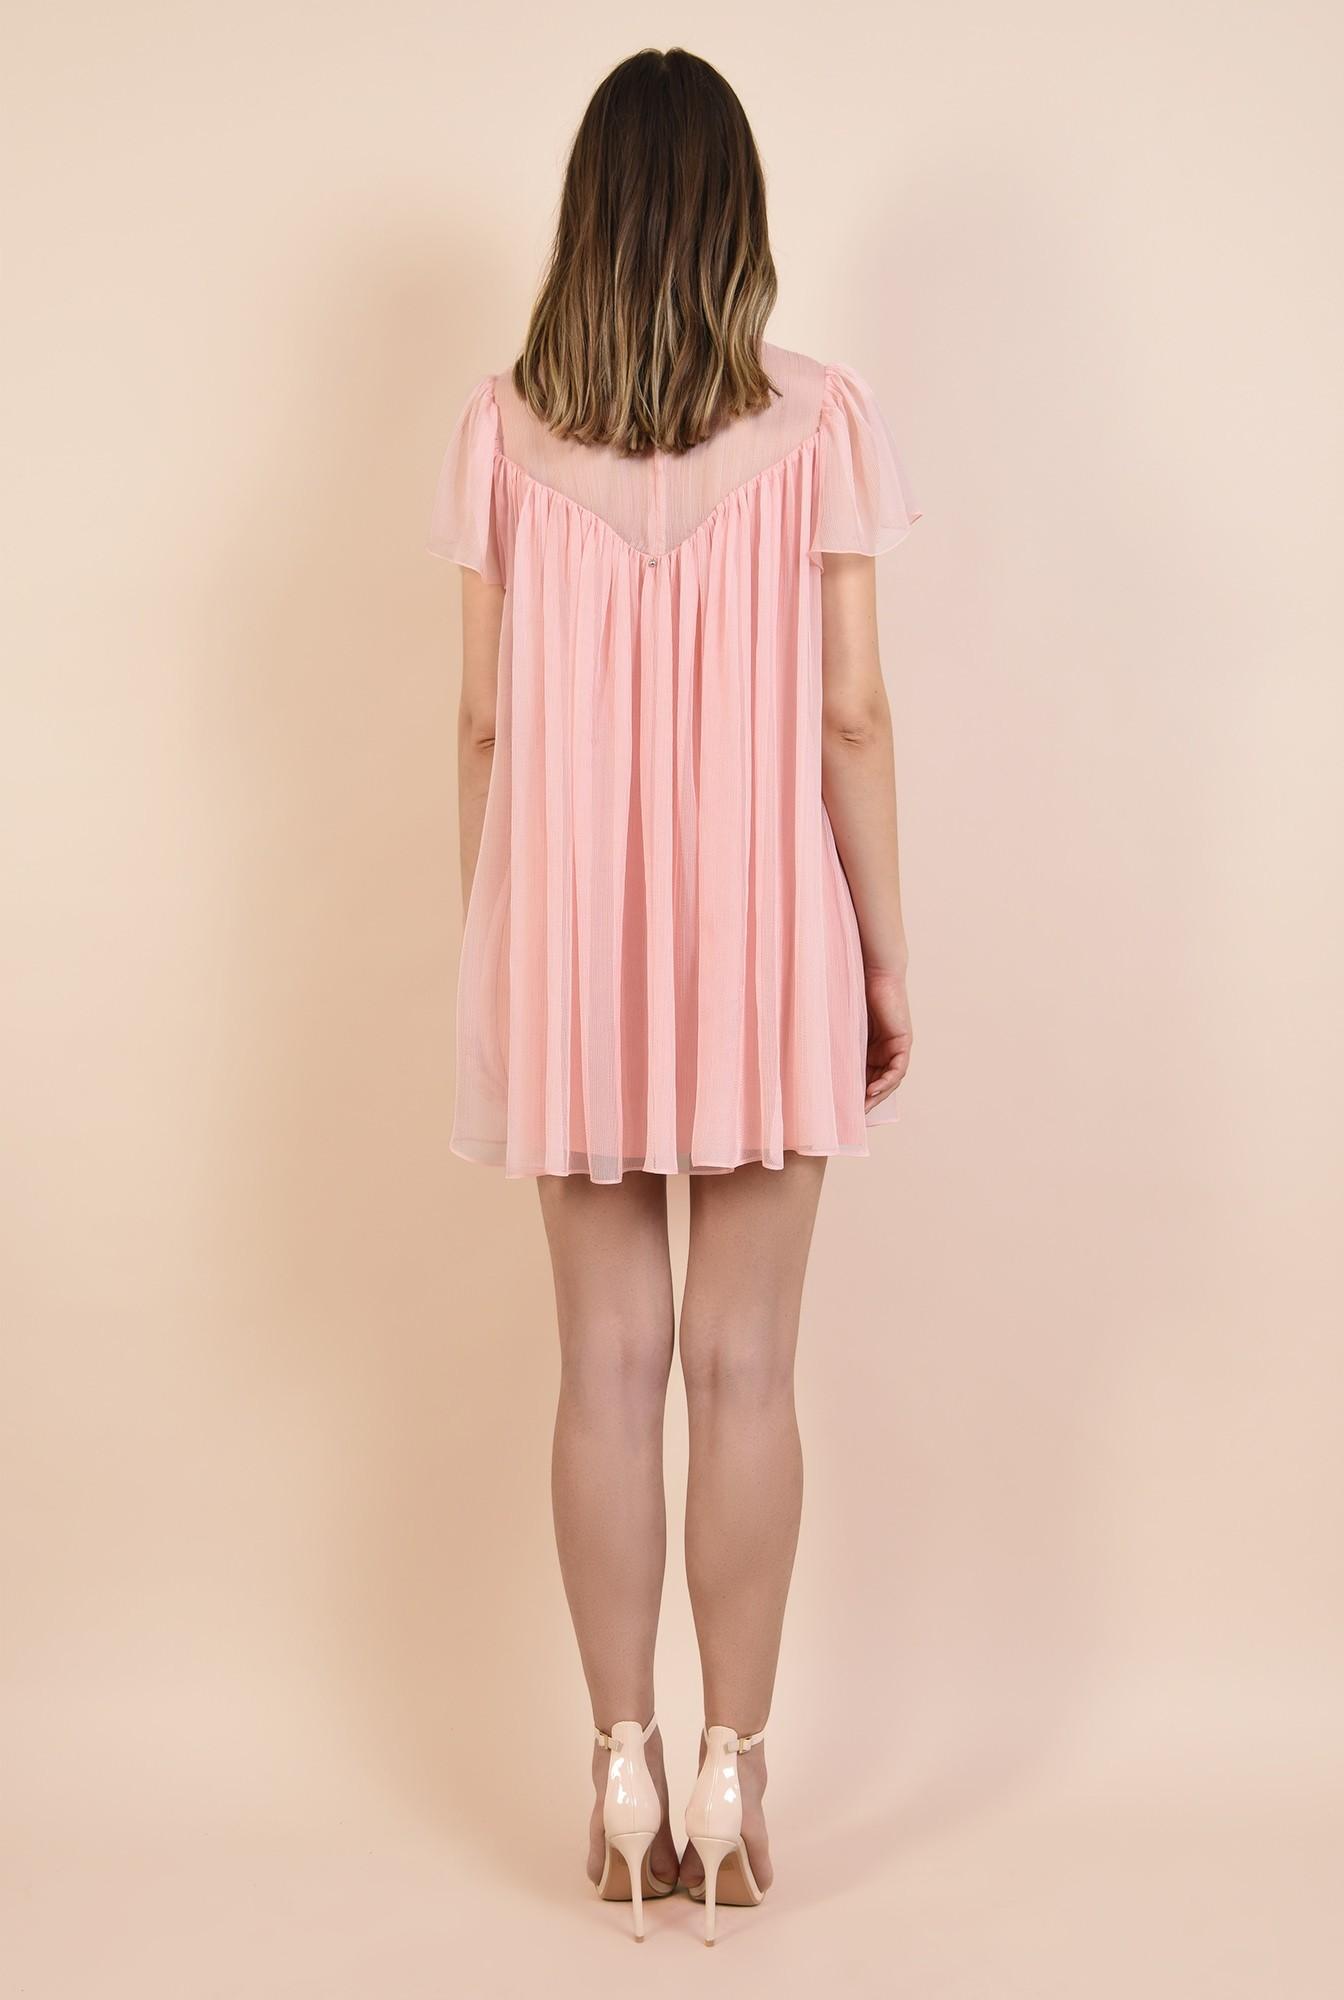 1 - 360 - rochie eleganta, din voal creponat, roz, mini, babydoll